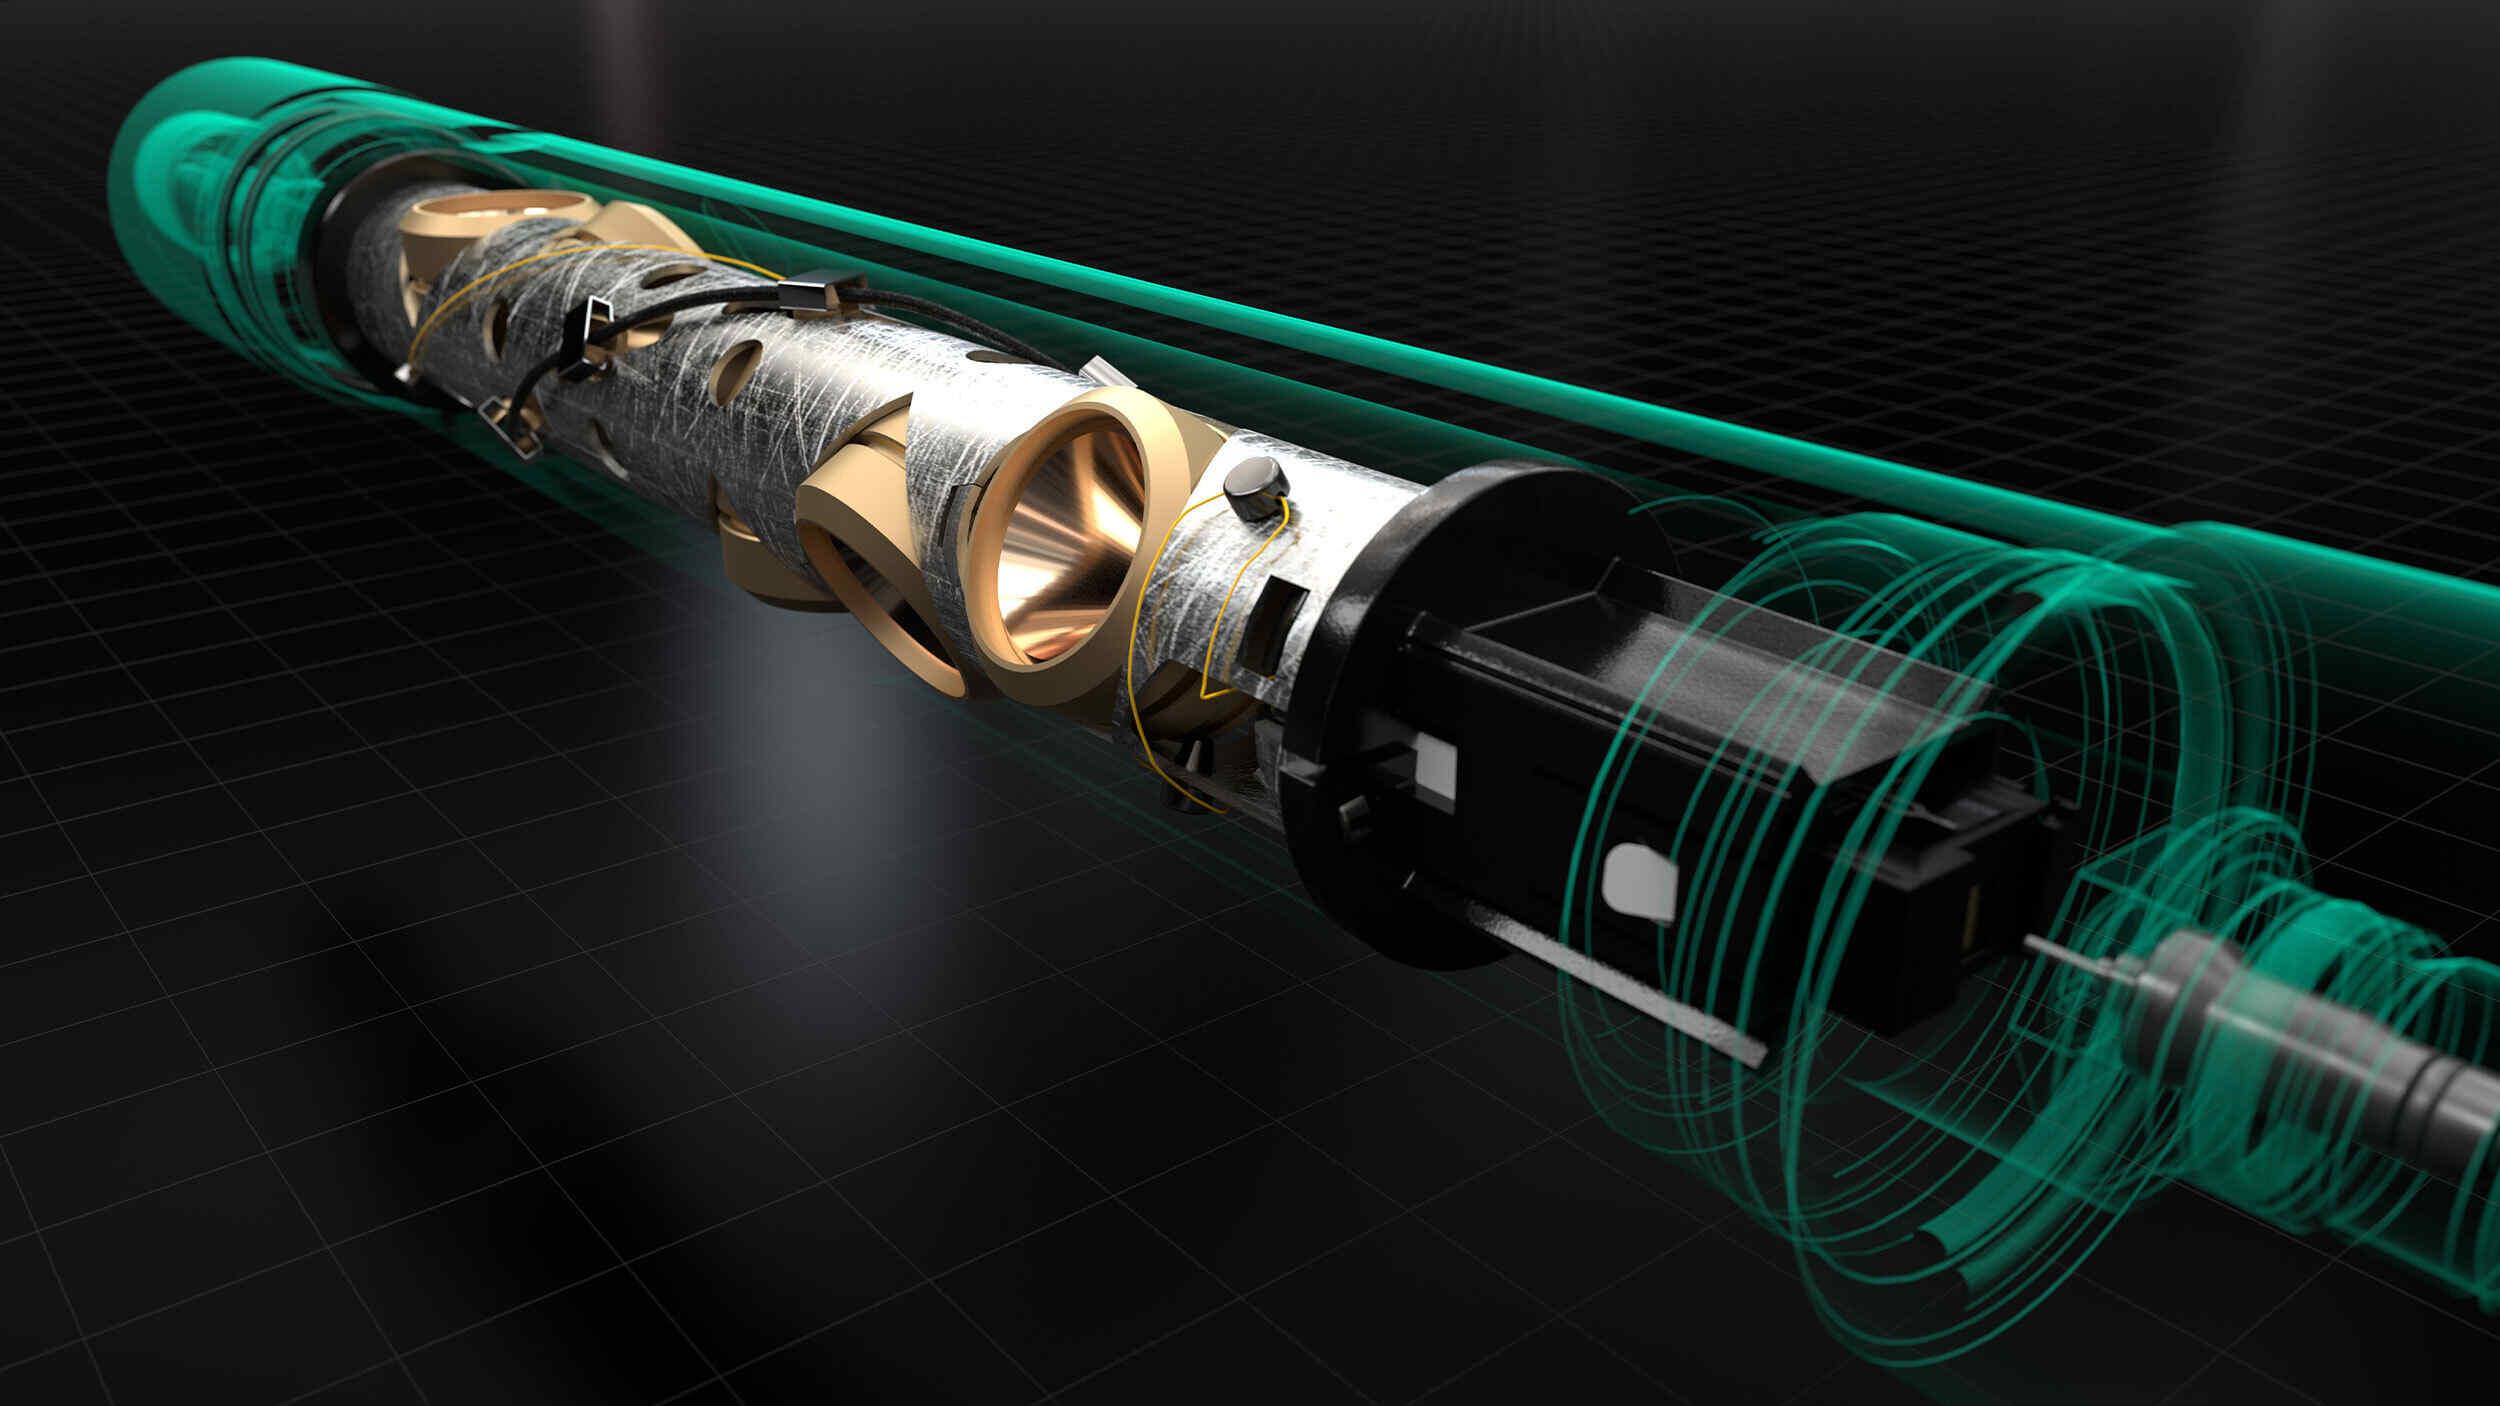 Velocity™ Perforating System